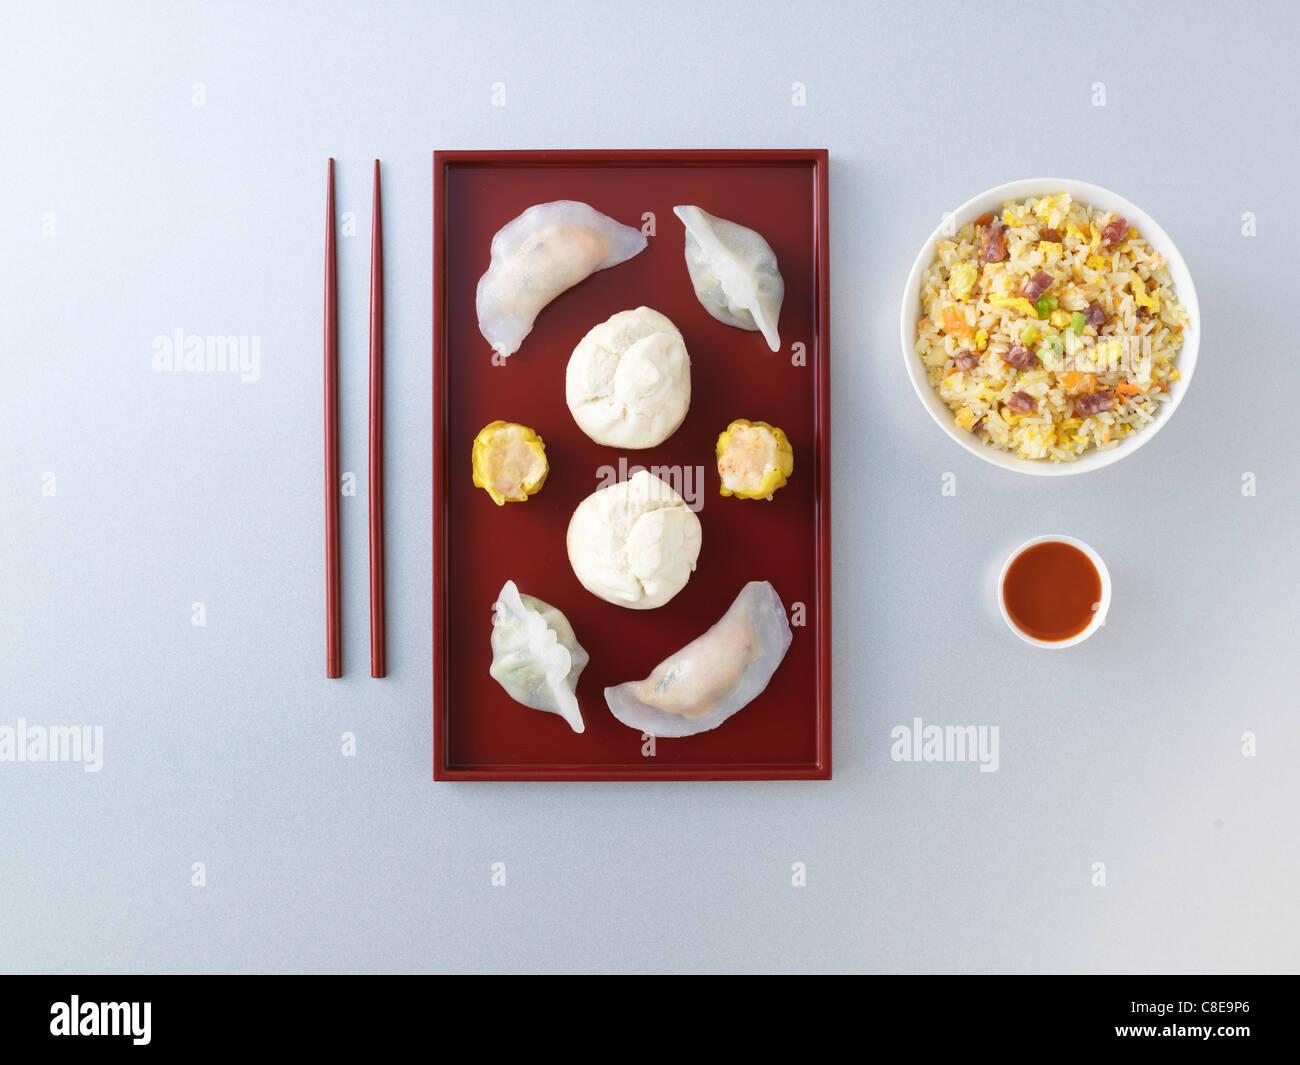 Asian raviolis and Cantonese rice - Stock Image